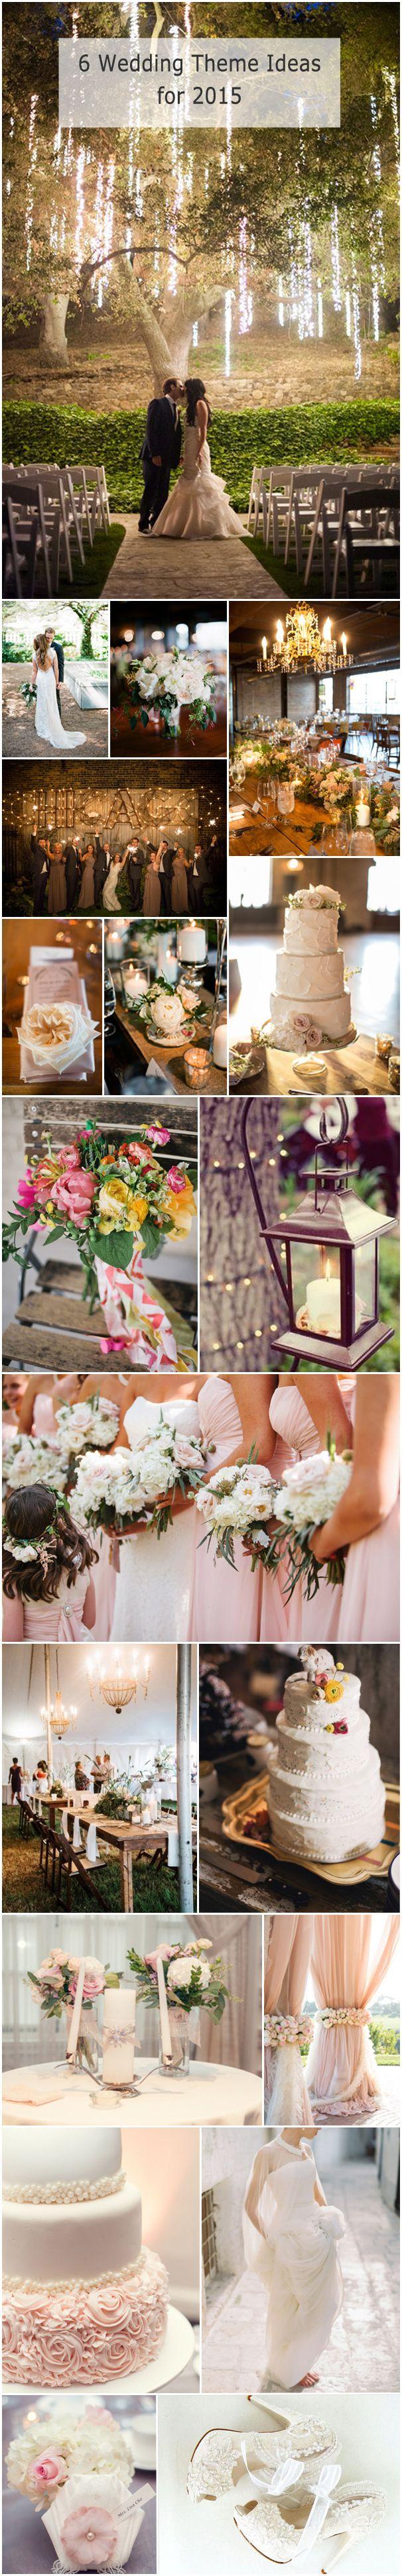 #weddingideas #weddingthemes top 6 trending wedding theme ideas for 2015